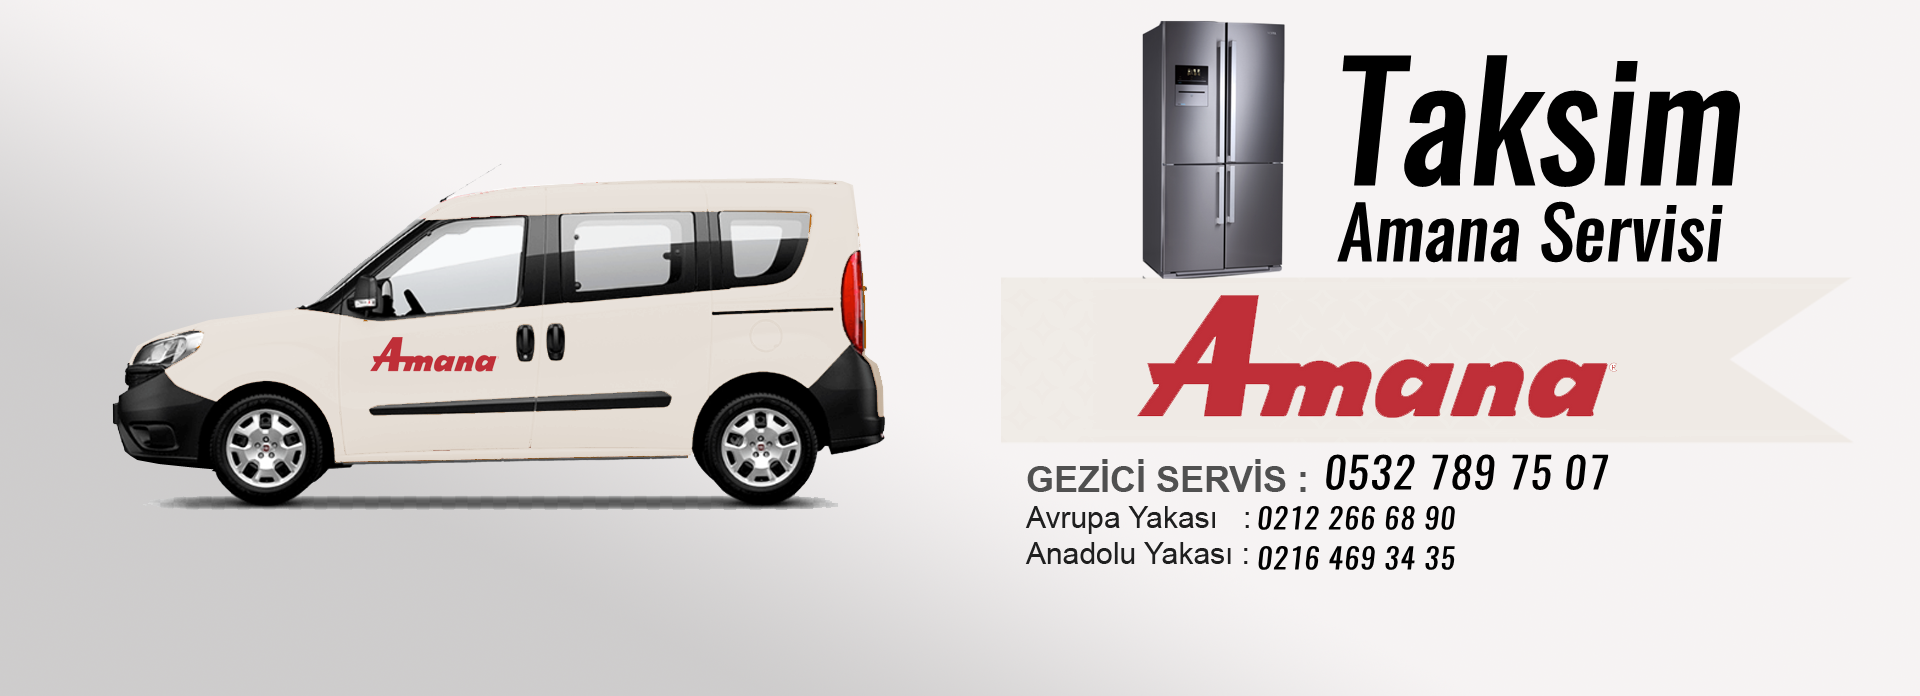 Taksim Amana Servisi